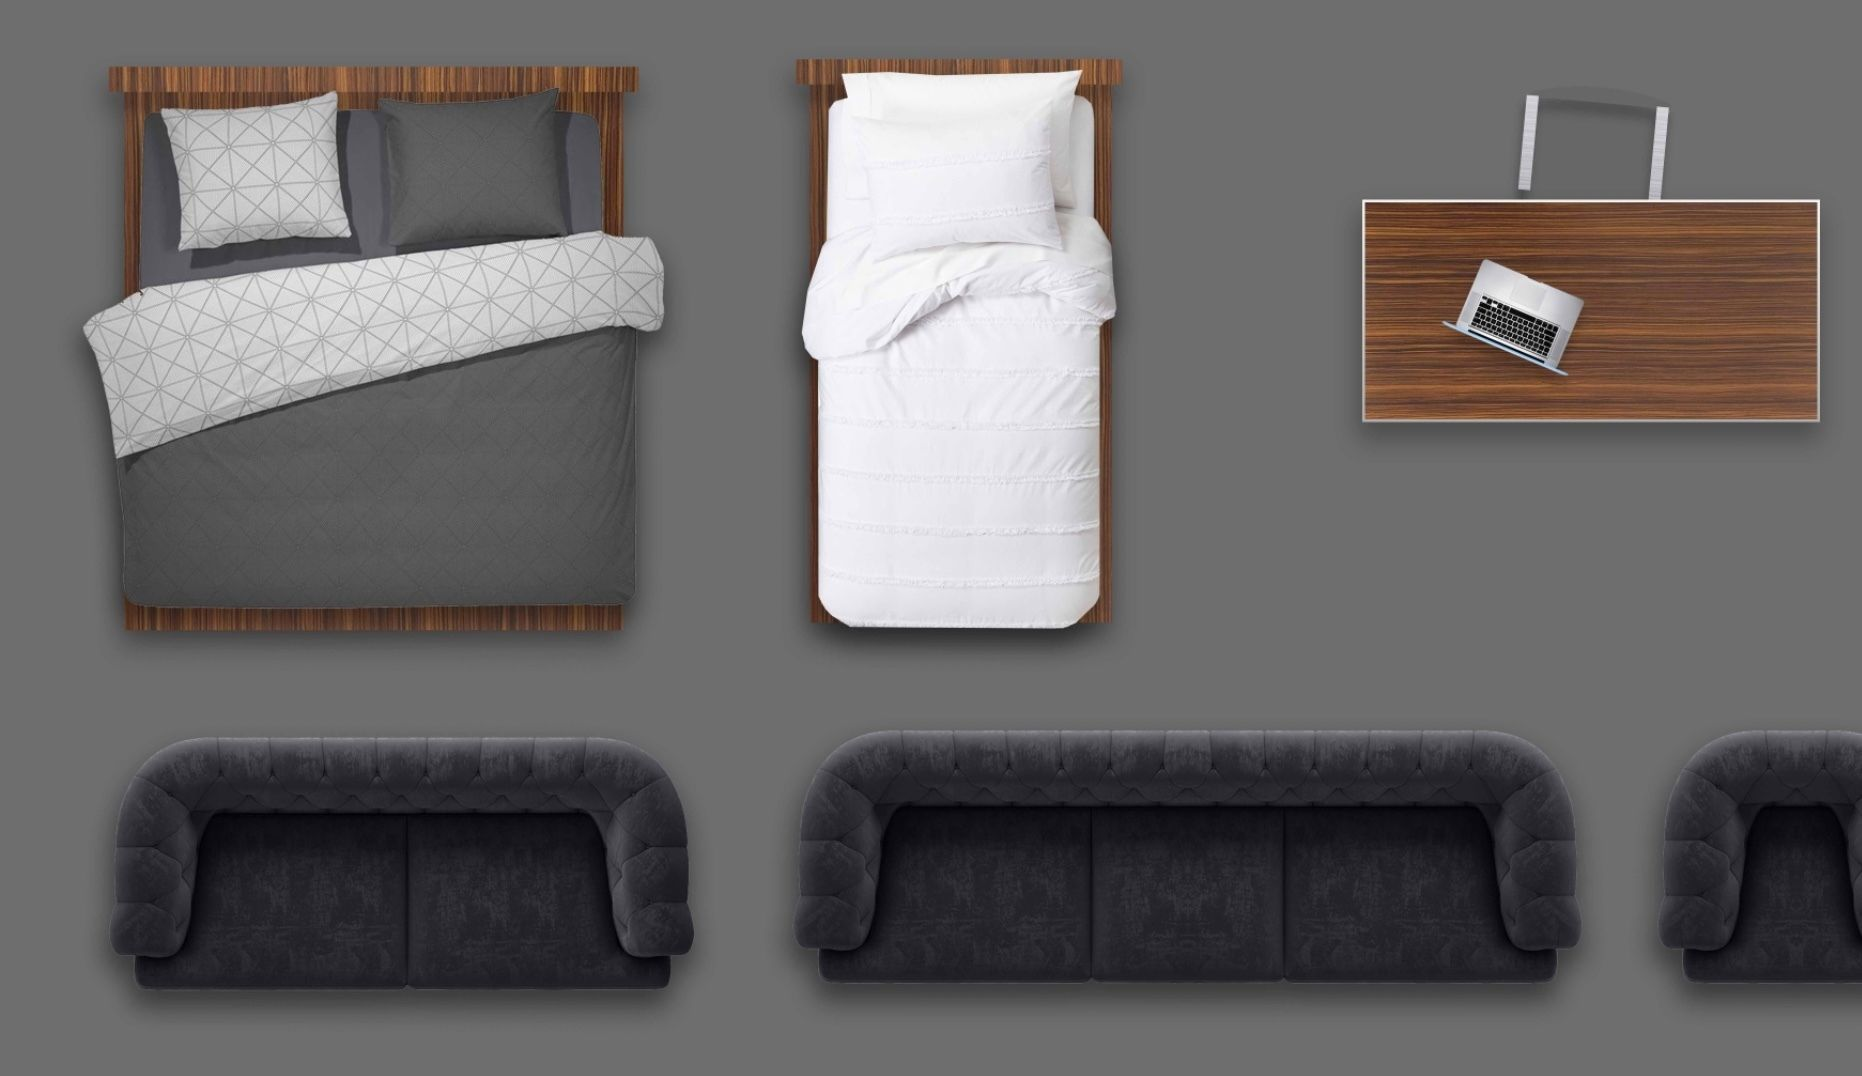 2d furniture floorplan top view PSD 3D model render top